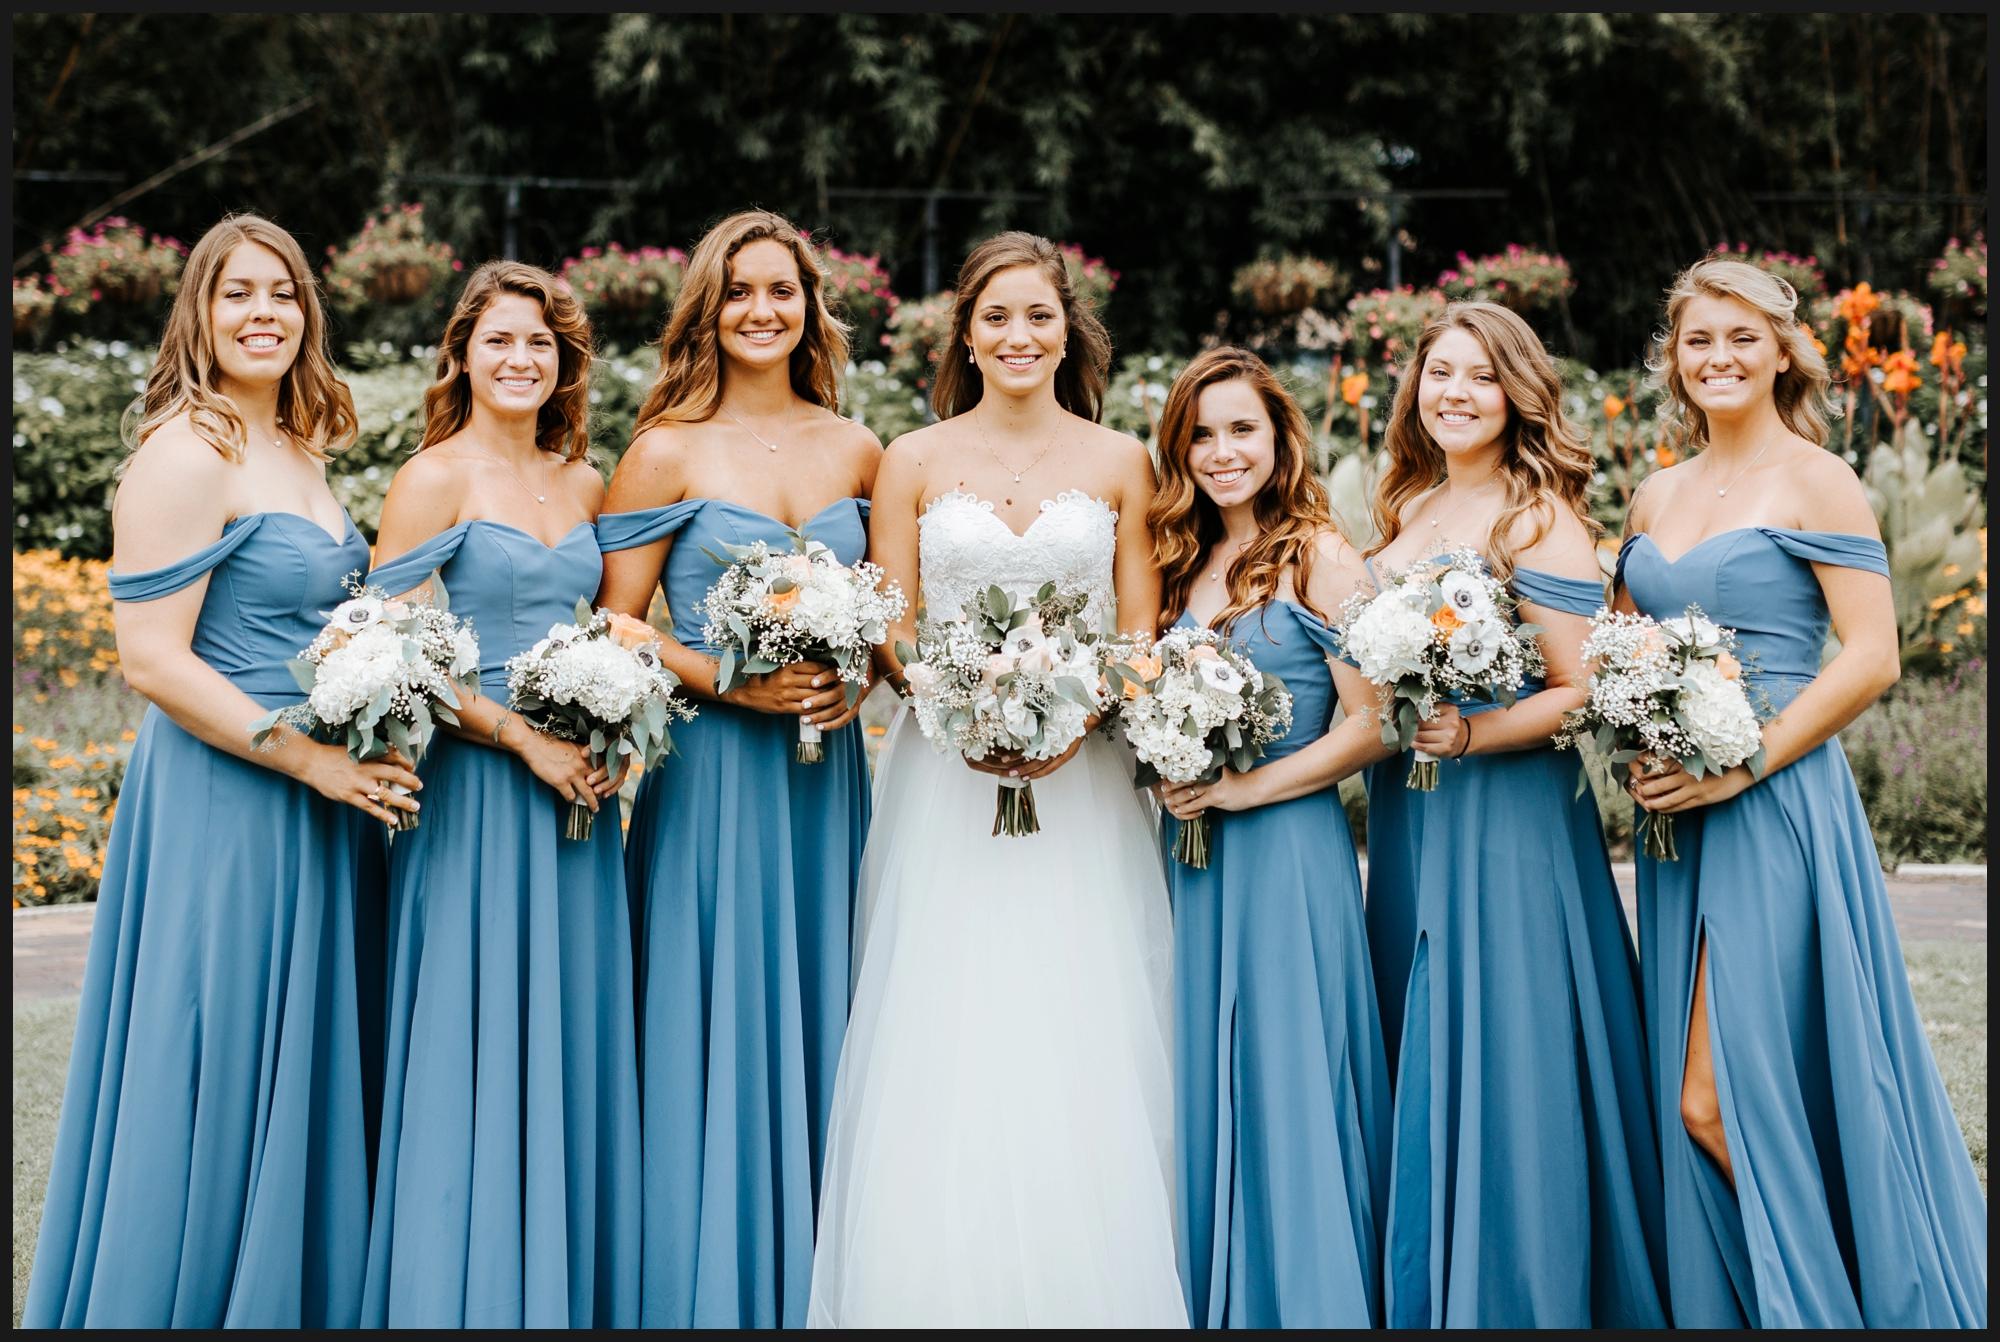 Orlando-Wedding-Photographer-destination-wedding-photographer-florida-wedding-photographer-bohemian-wedding-photographer_0032.jpg